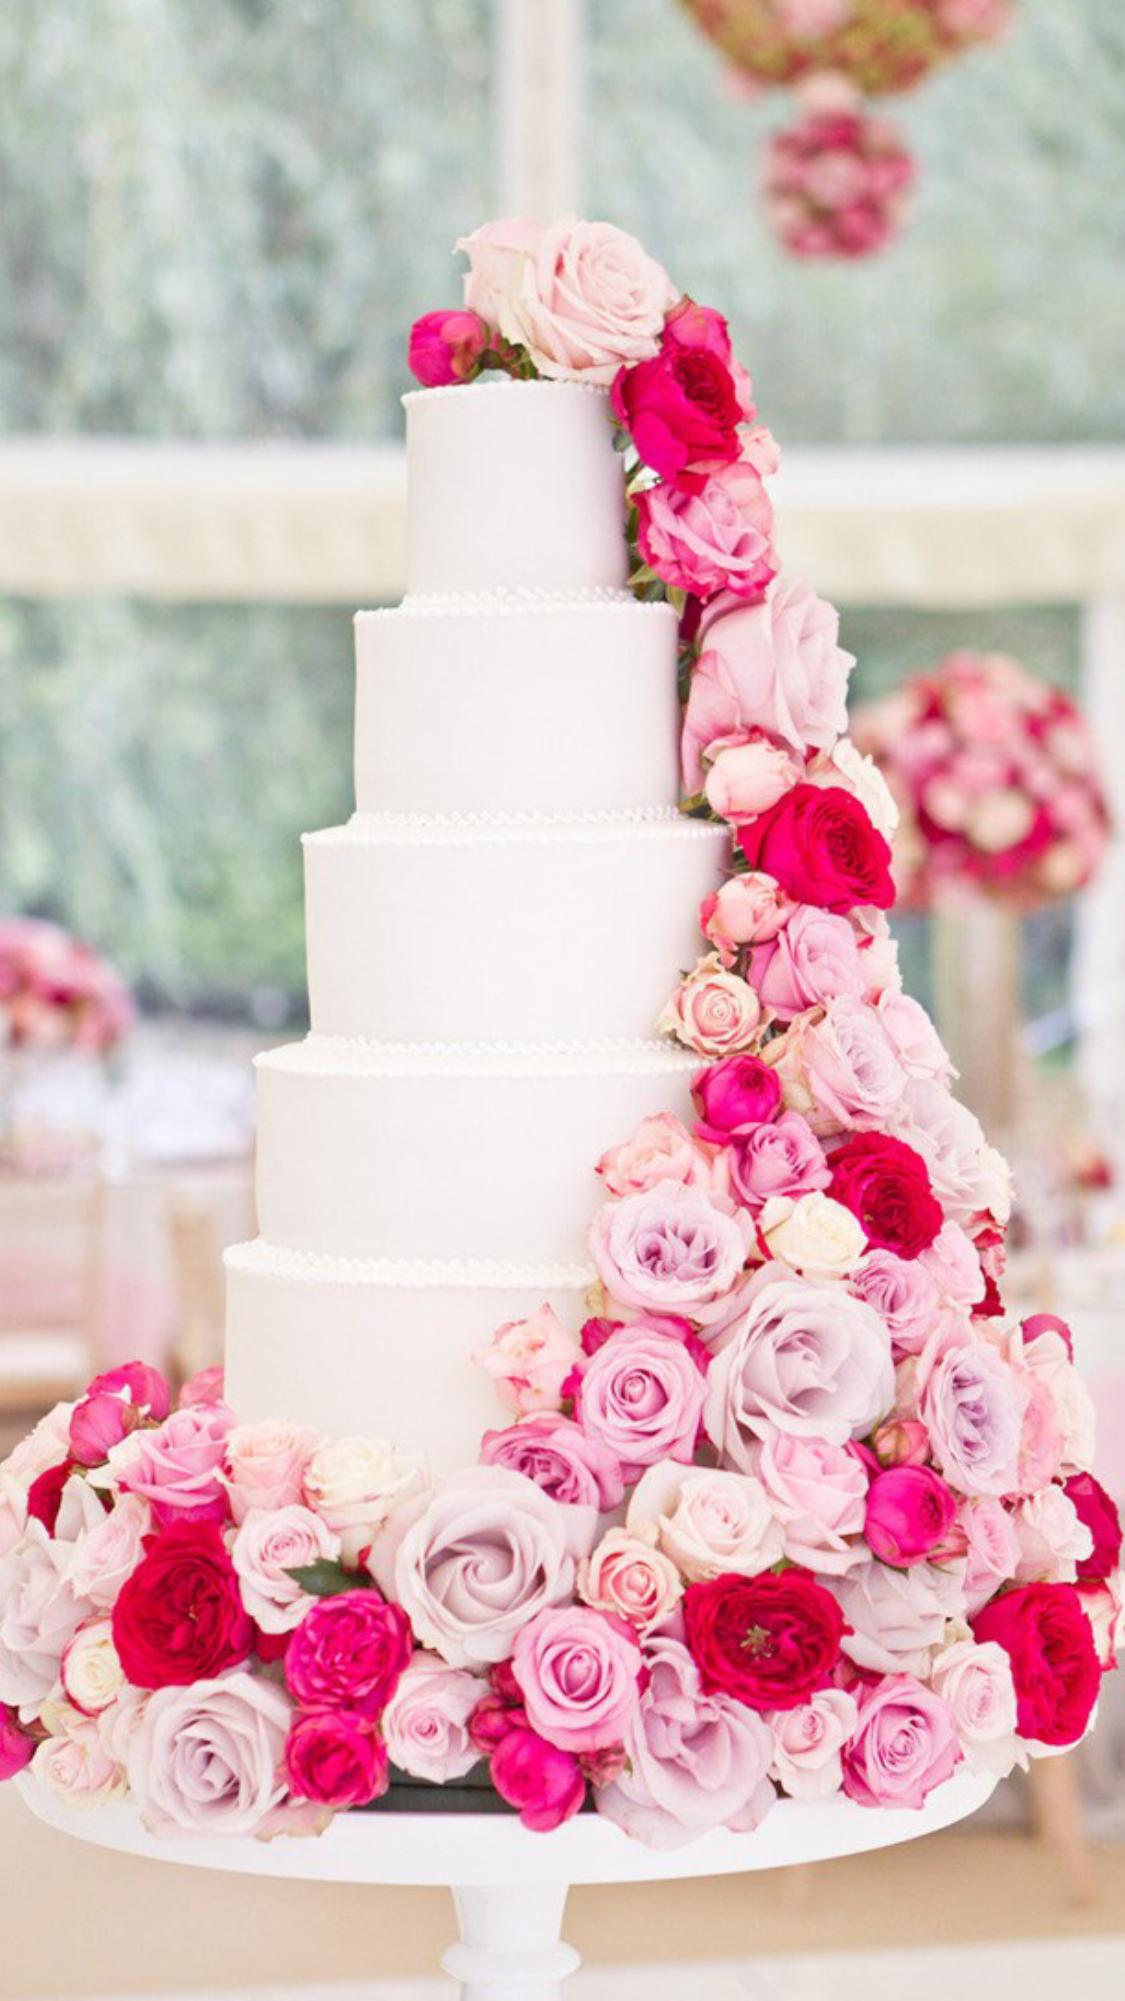 Pin by Lori Ann Wilson on Wedding Cakes   Pinterest   Wedding cake ...